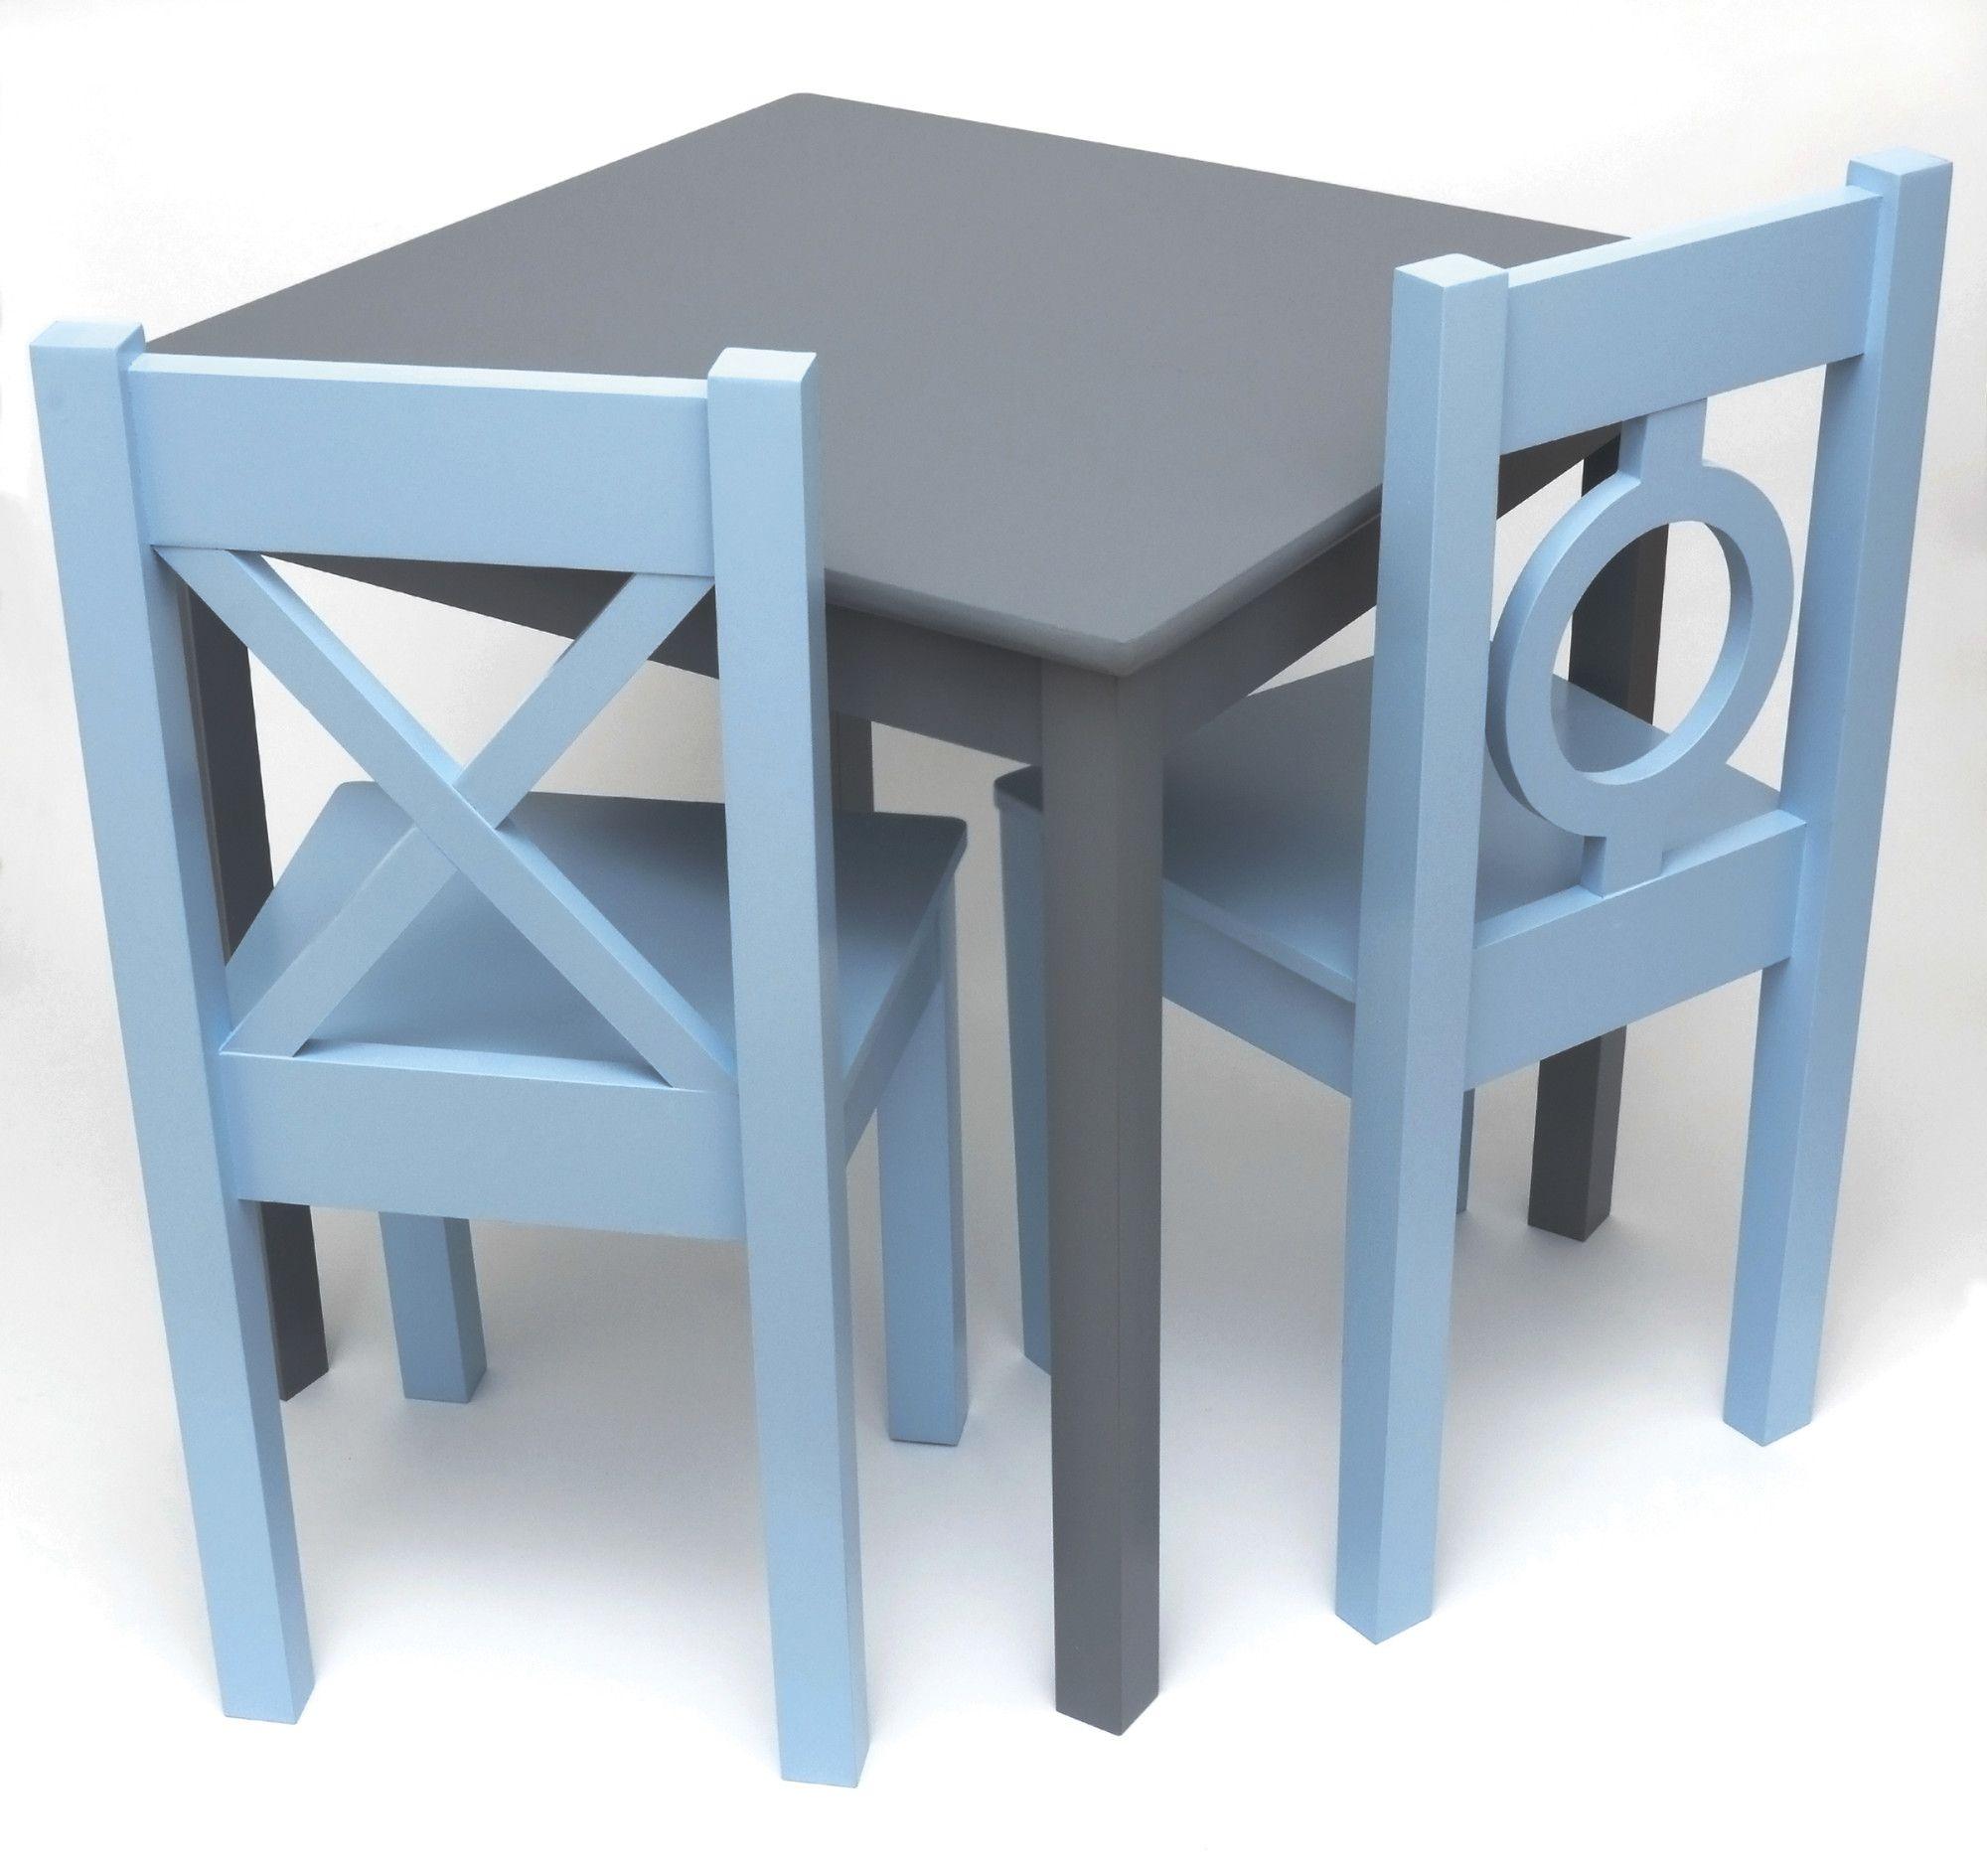 kid's table and chair set  wayfair  vf   pinterest  kids s  - kid's table and chair set  wayfair